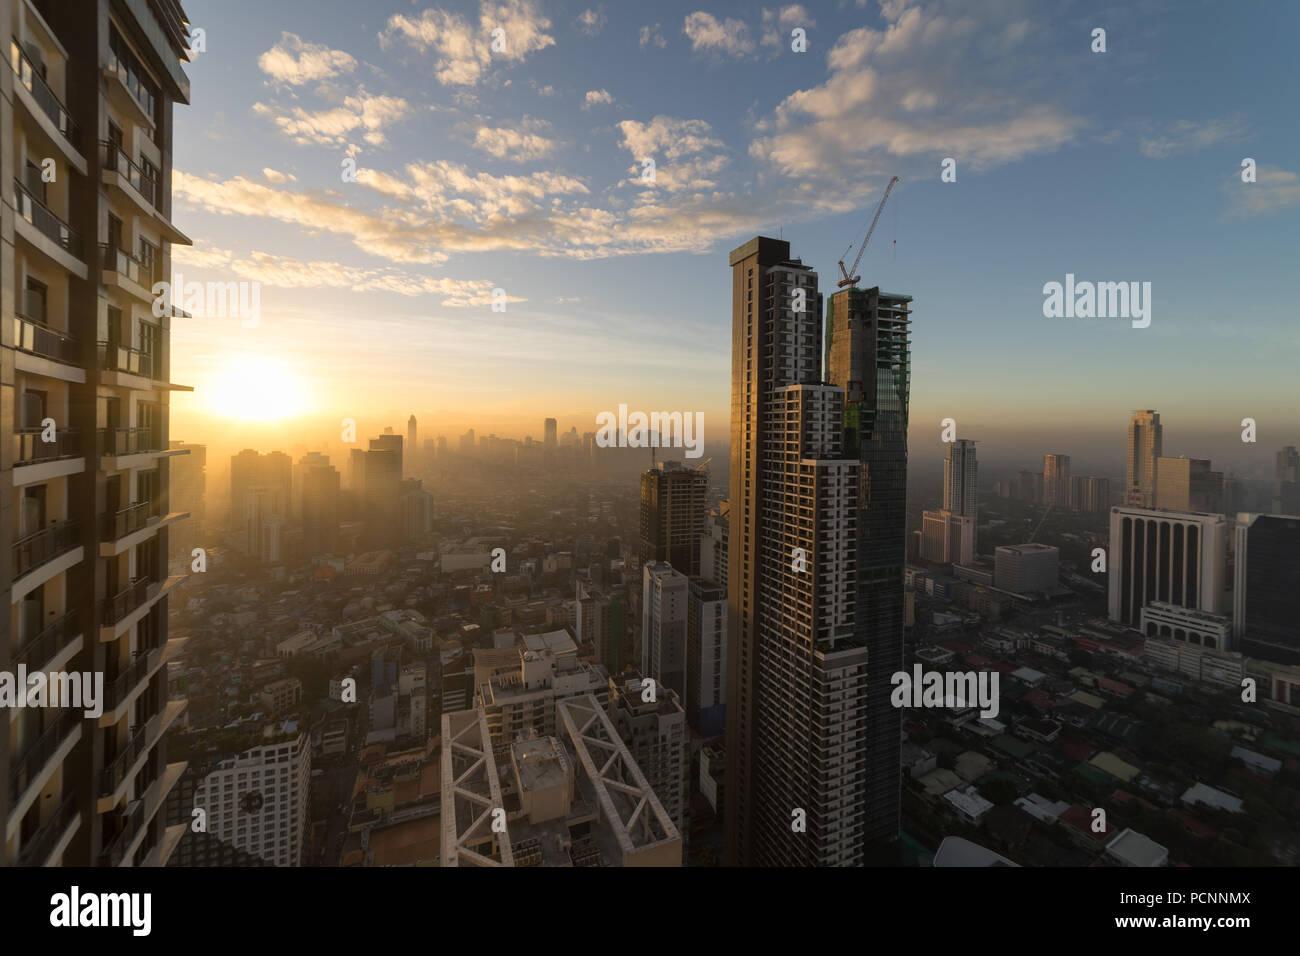 Manila city taken from a high rise condominium - Stock Image